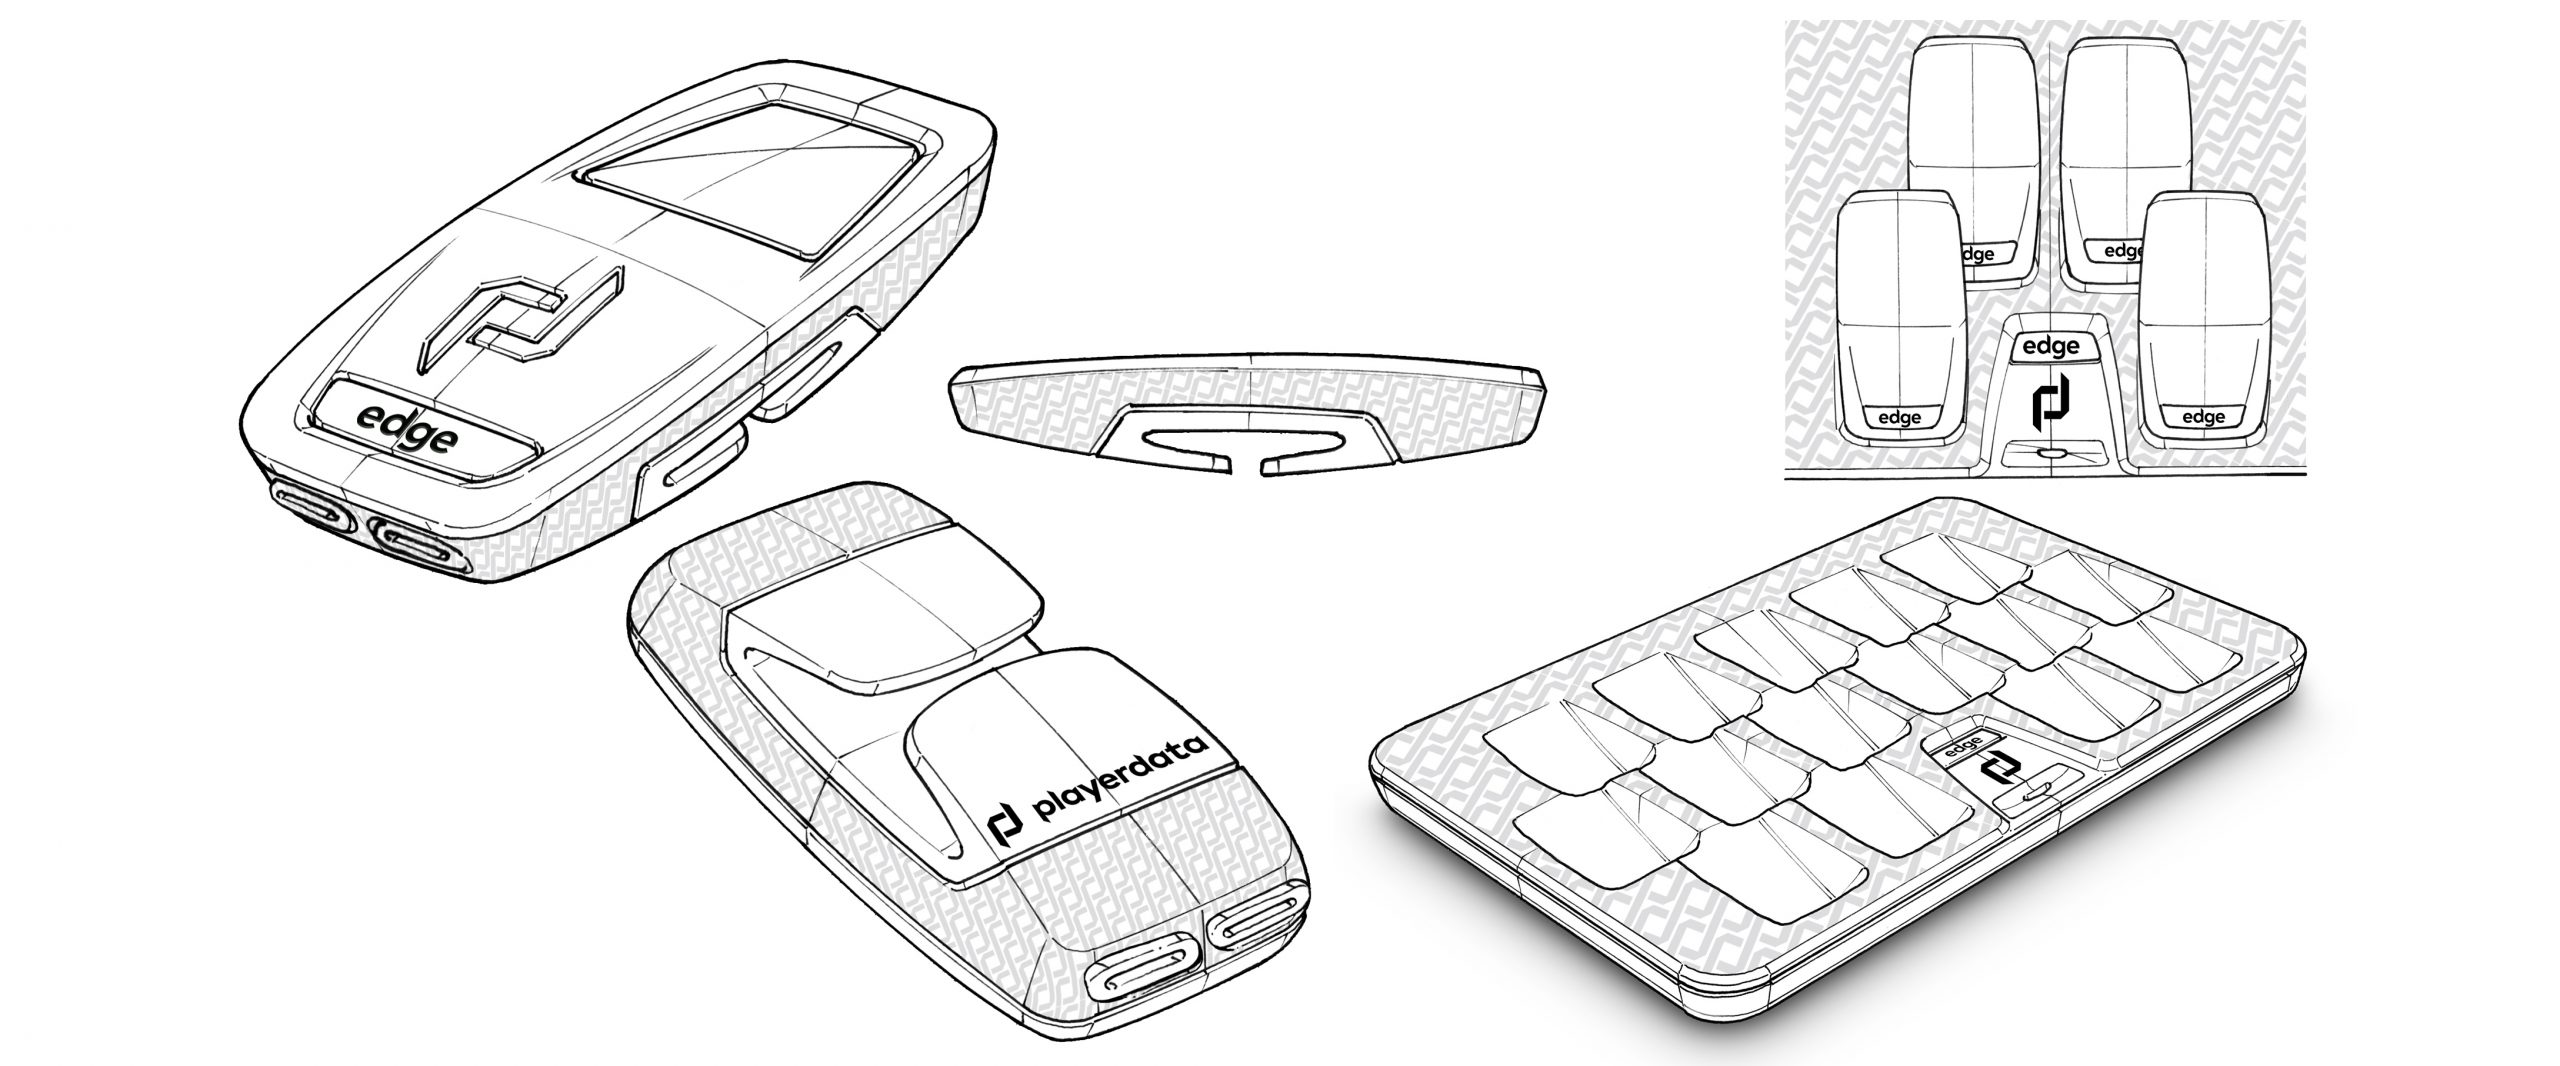 player data i4 product design